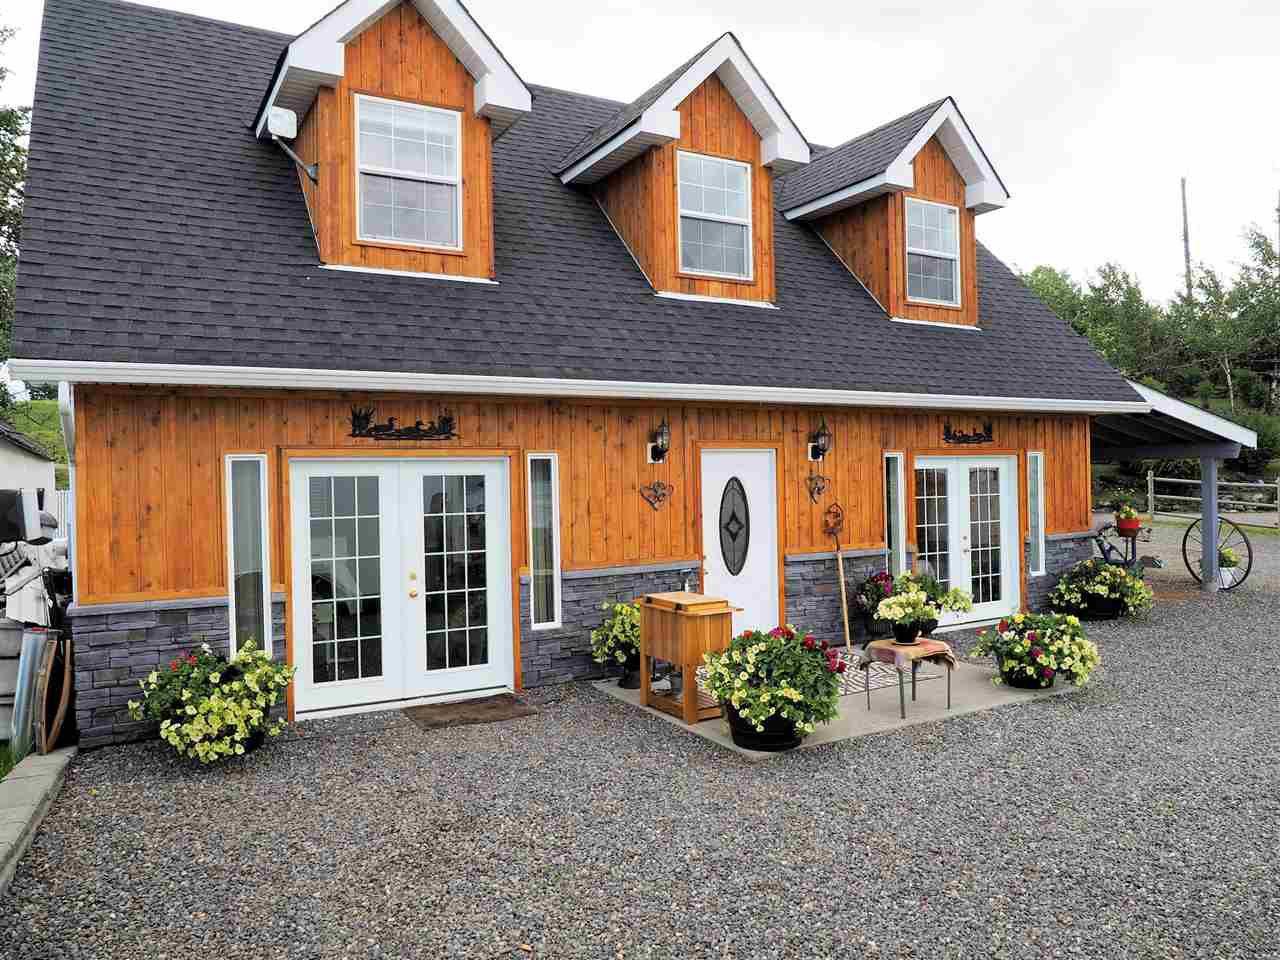 Main Photo: 4068 MCKINLEY Drive: Lac la Hache House for sale (100 Mile House (Zone 10))  : MLS®# R2397929